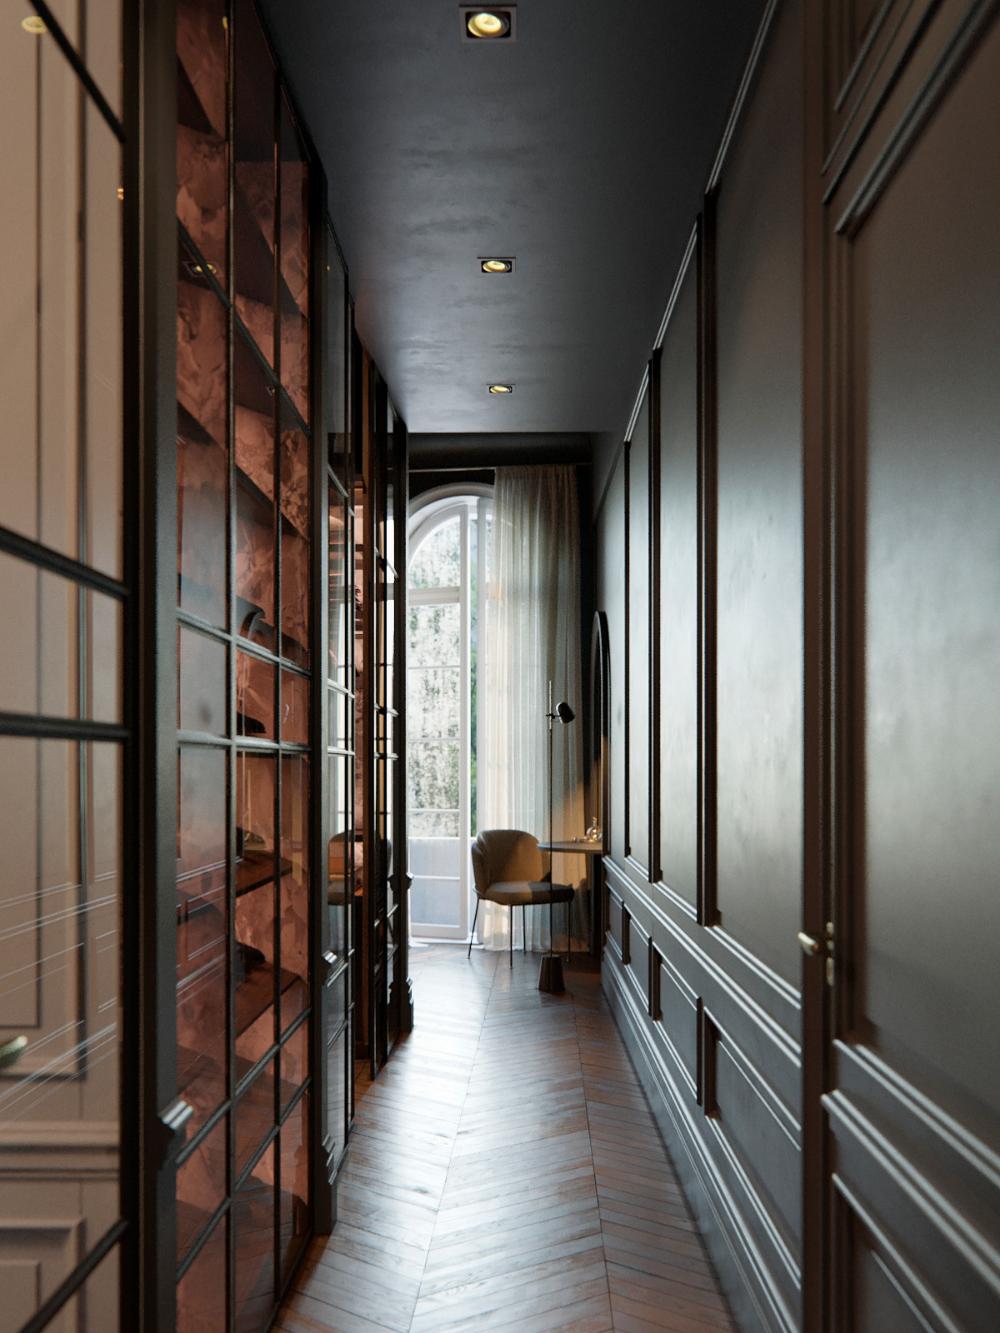 Autodesk Room Design: Spacious Apartments In Sardinia. Bedroom. On Behance